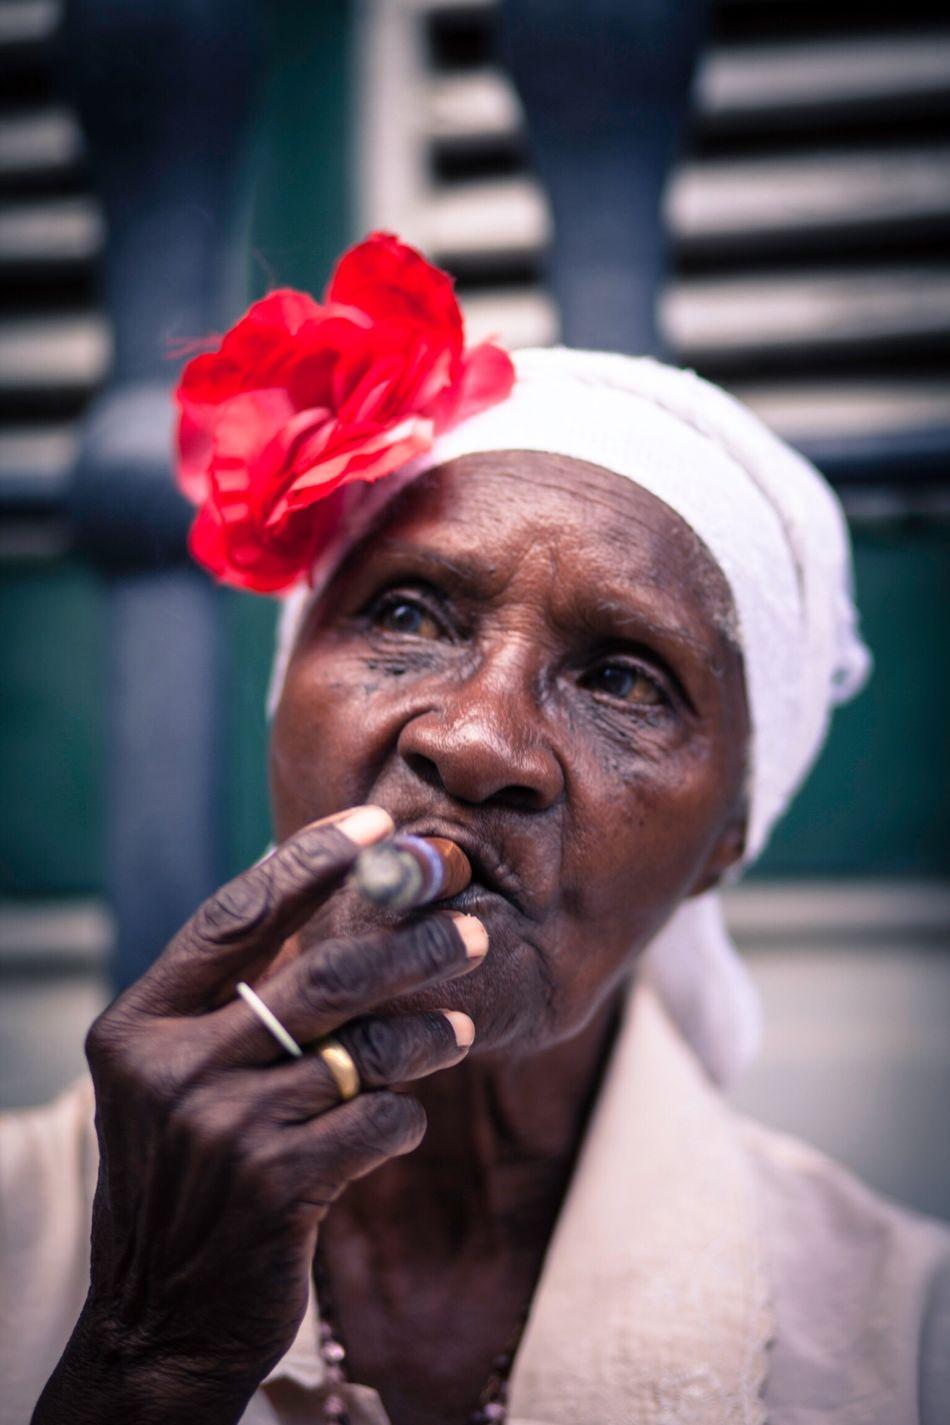 Cuba People Sigar Potrait Up Close Street Photography Travel Vacation Havana Cuban Holiday City Life Old Lady The Portraitist - 2016 EyeEm Awards